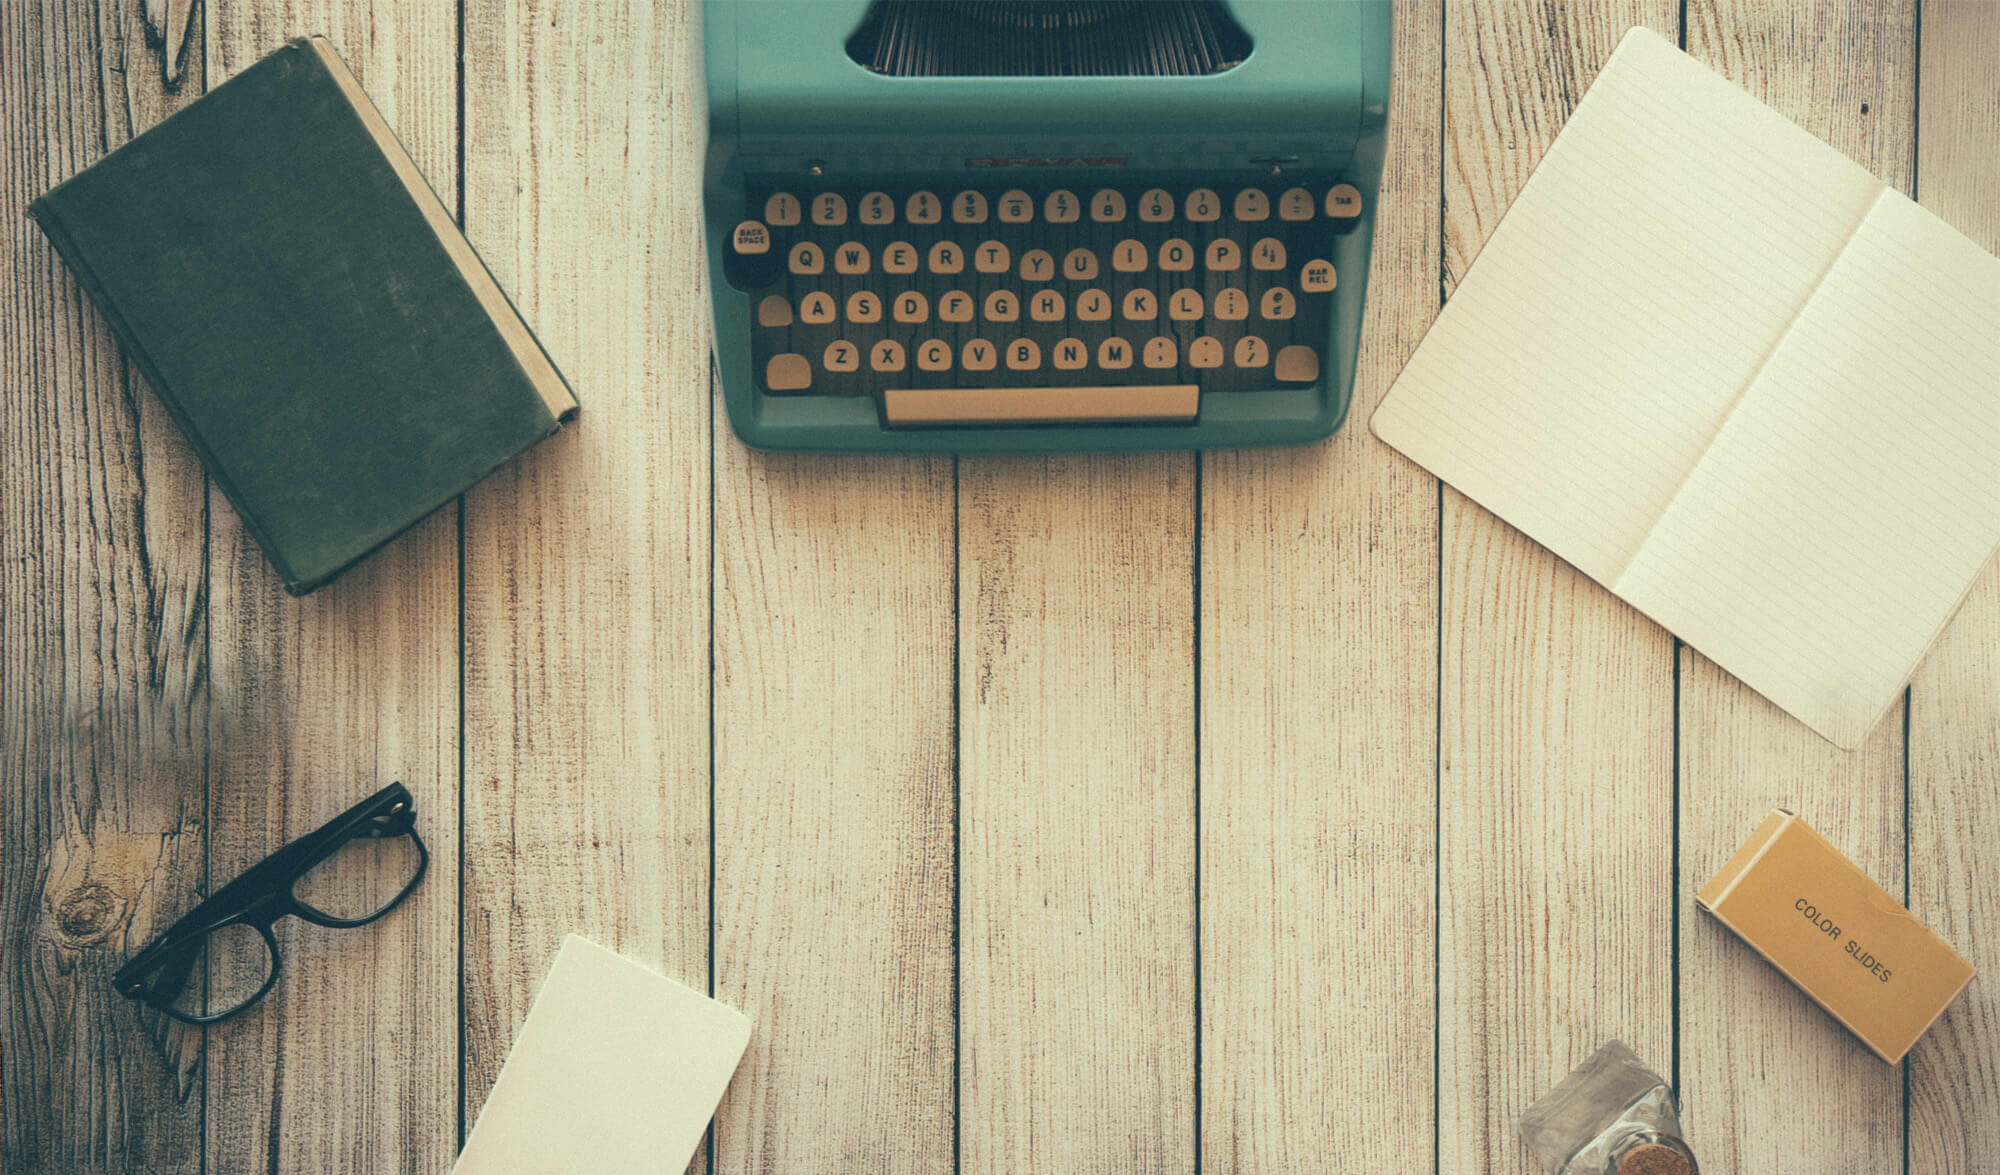 Do undergraduate write thesis